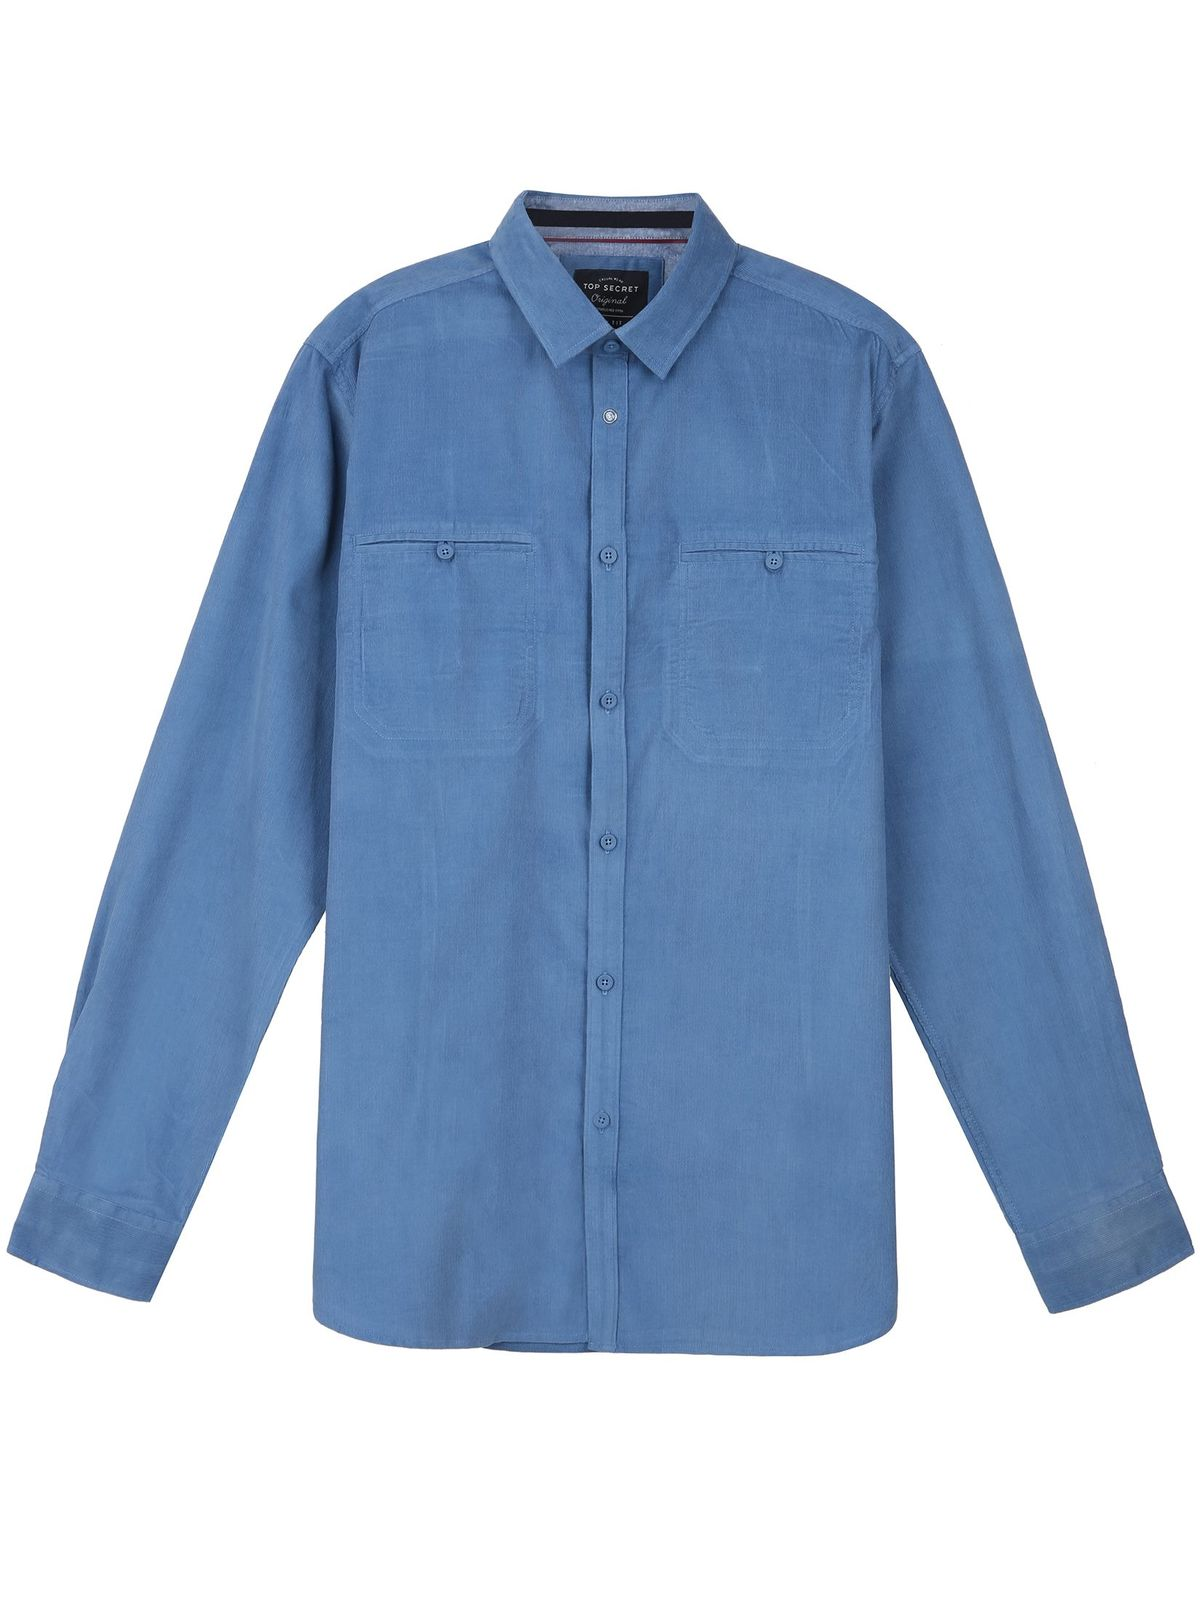 7ff671067ea Ανδρικά Ρούχα, Ανδρικά Πουκάμισα, Τζιν